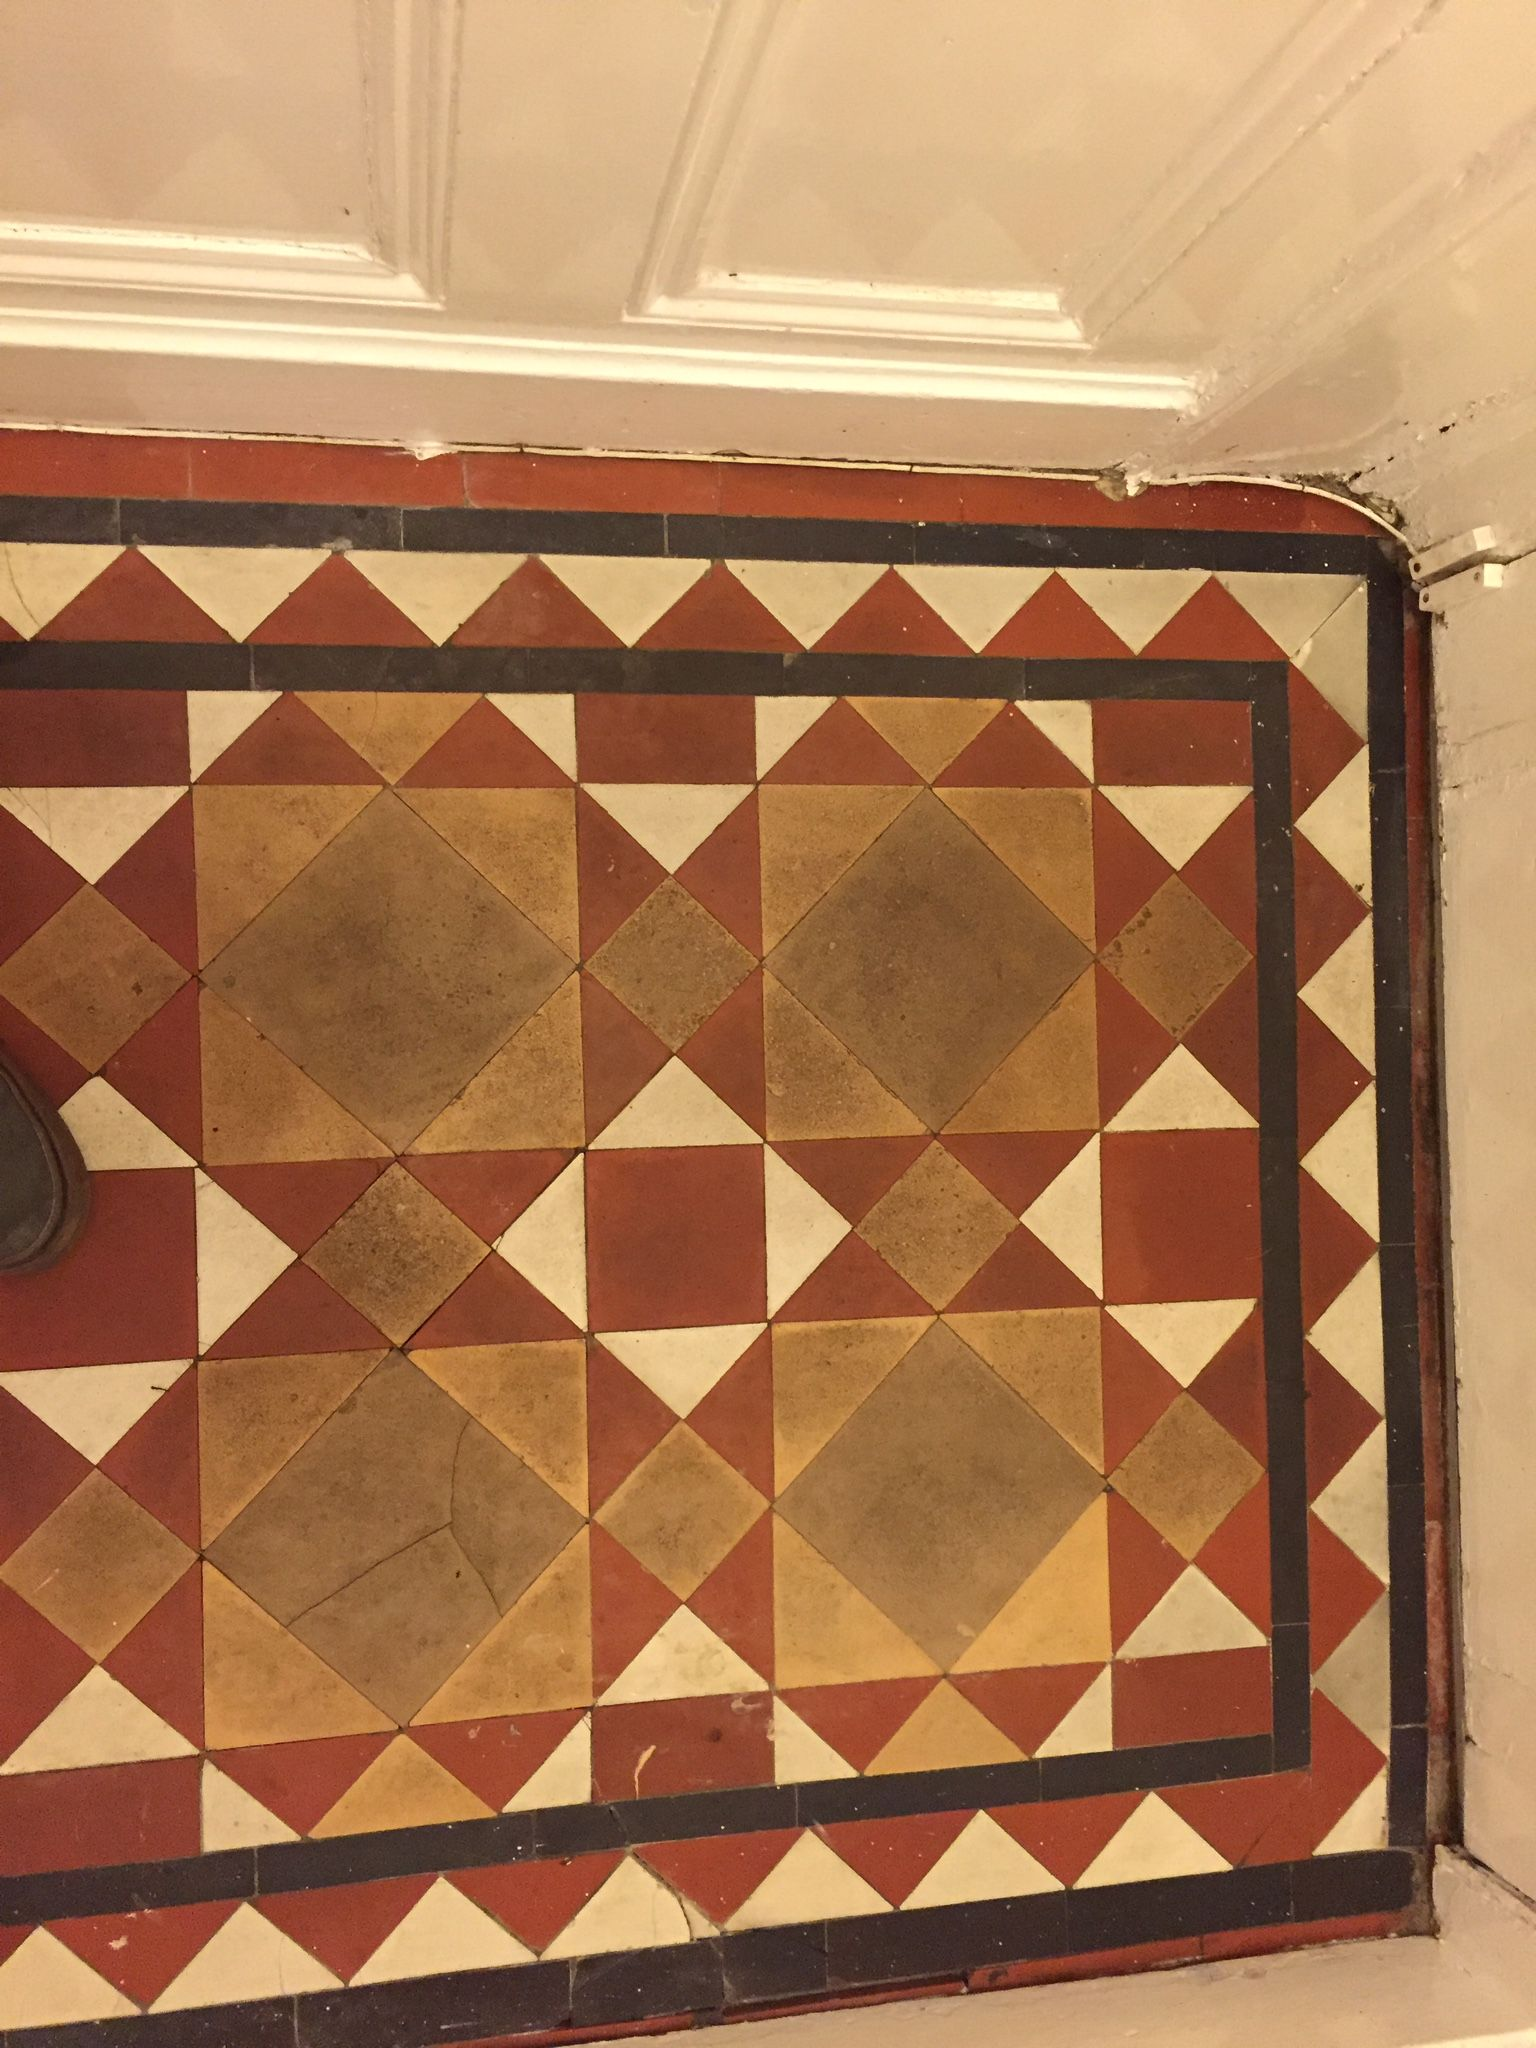 Original victorian mosaic tiled floor rear entrance hall steam original victorian mosaic tiled floor rear entrance hall steam cleaned ready for dailygadgetfo Images